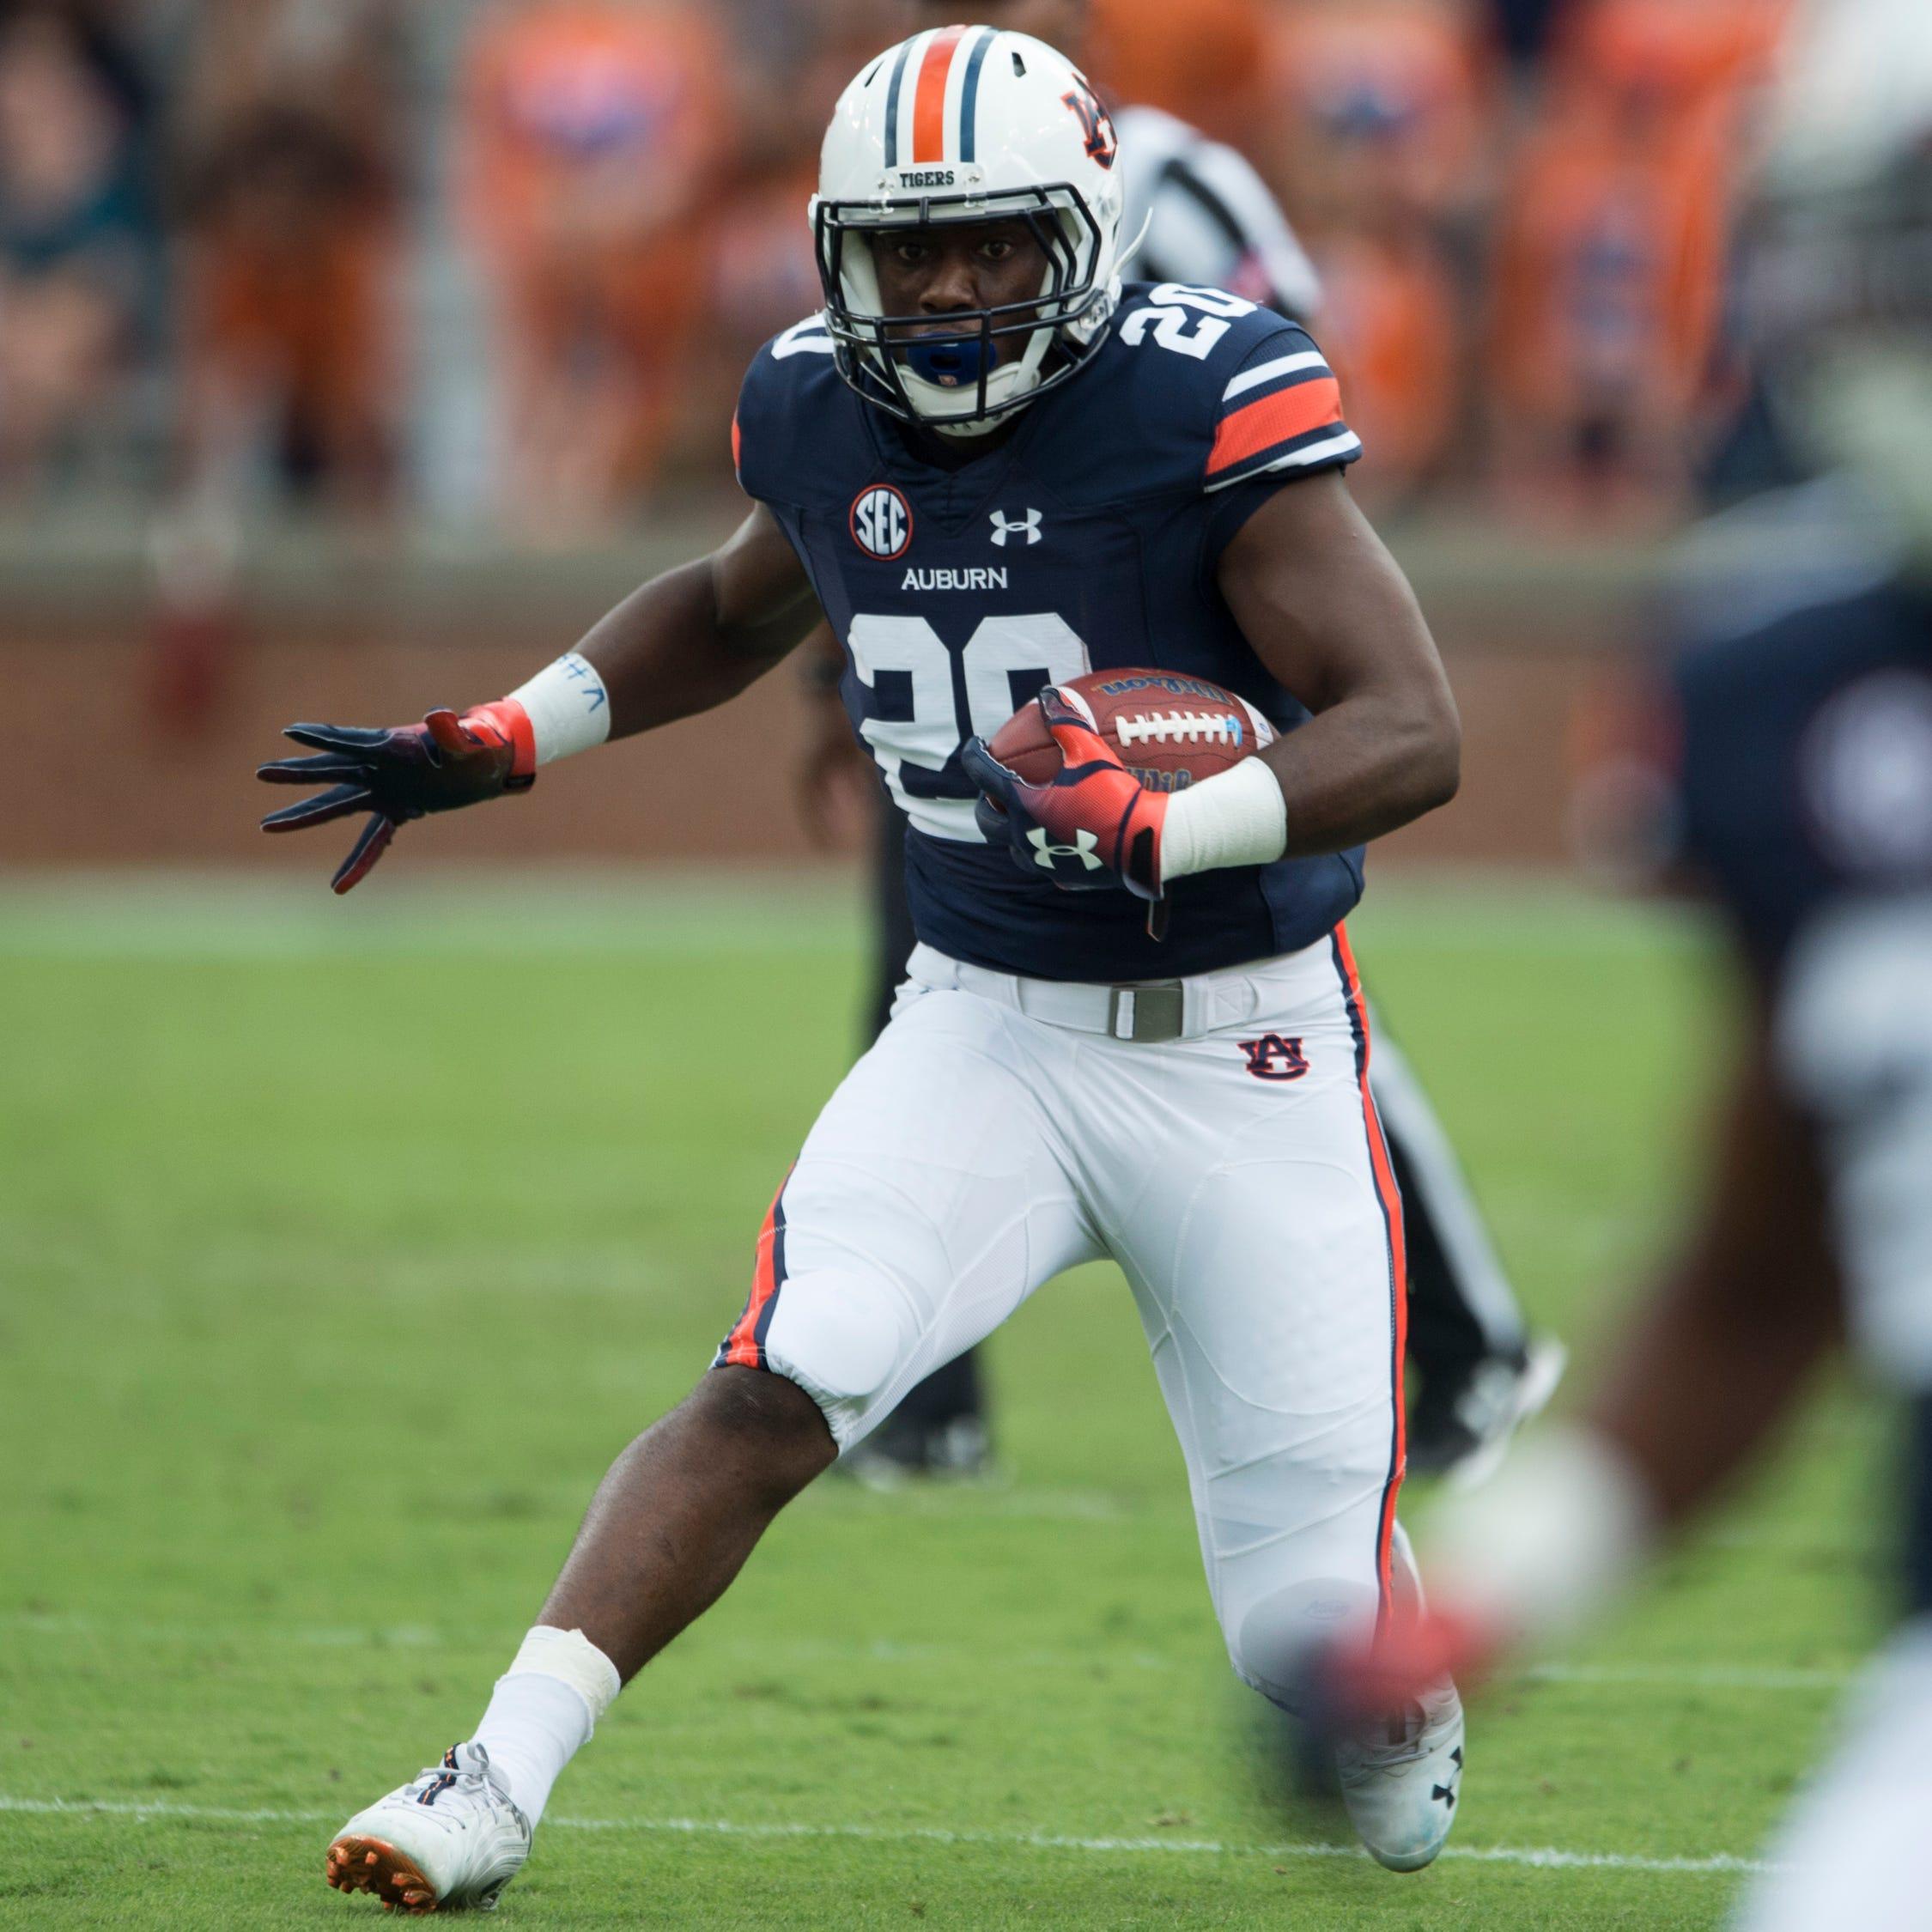 Running back Asa Martin will transfer from Auburn after puzzling true freshman season